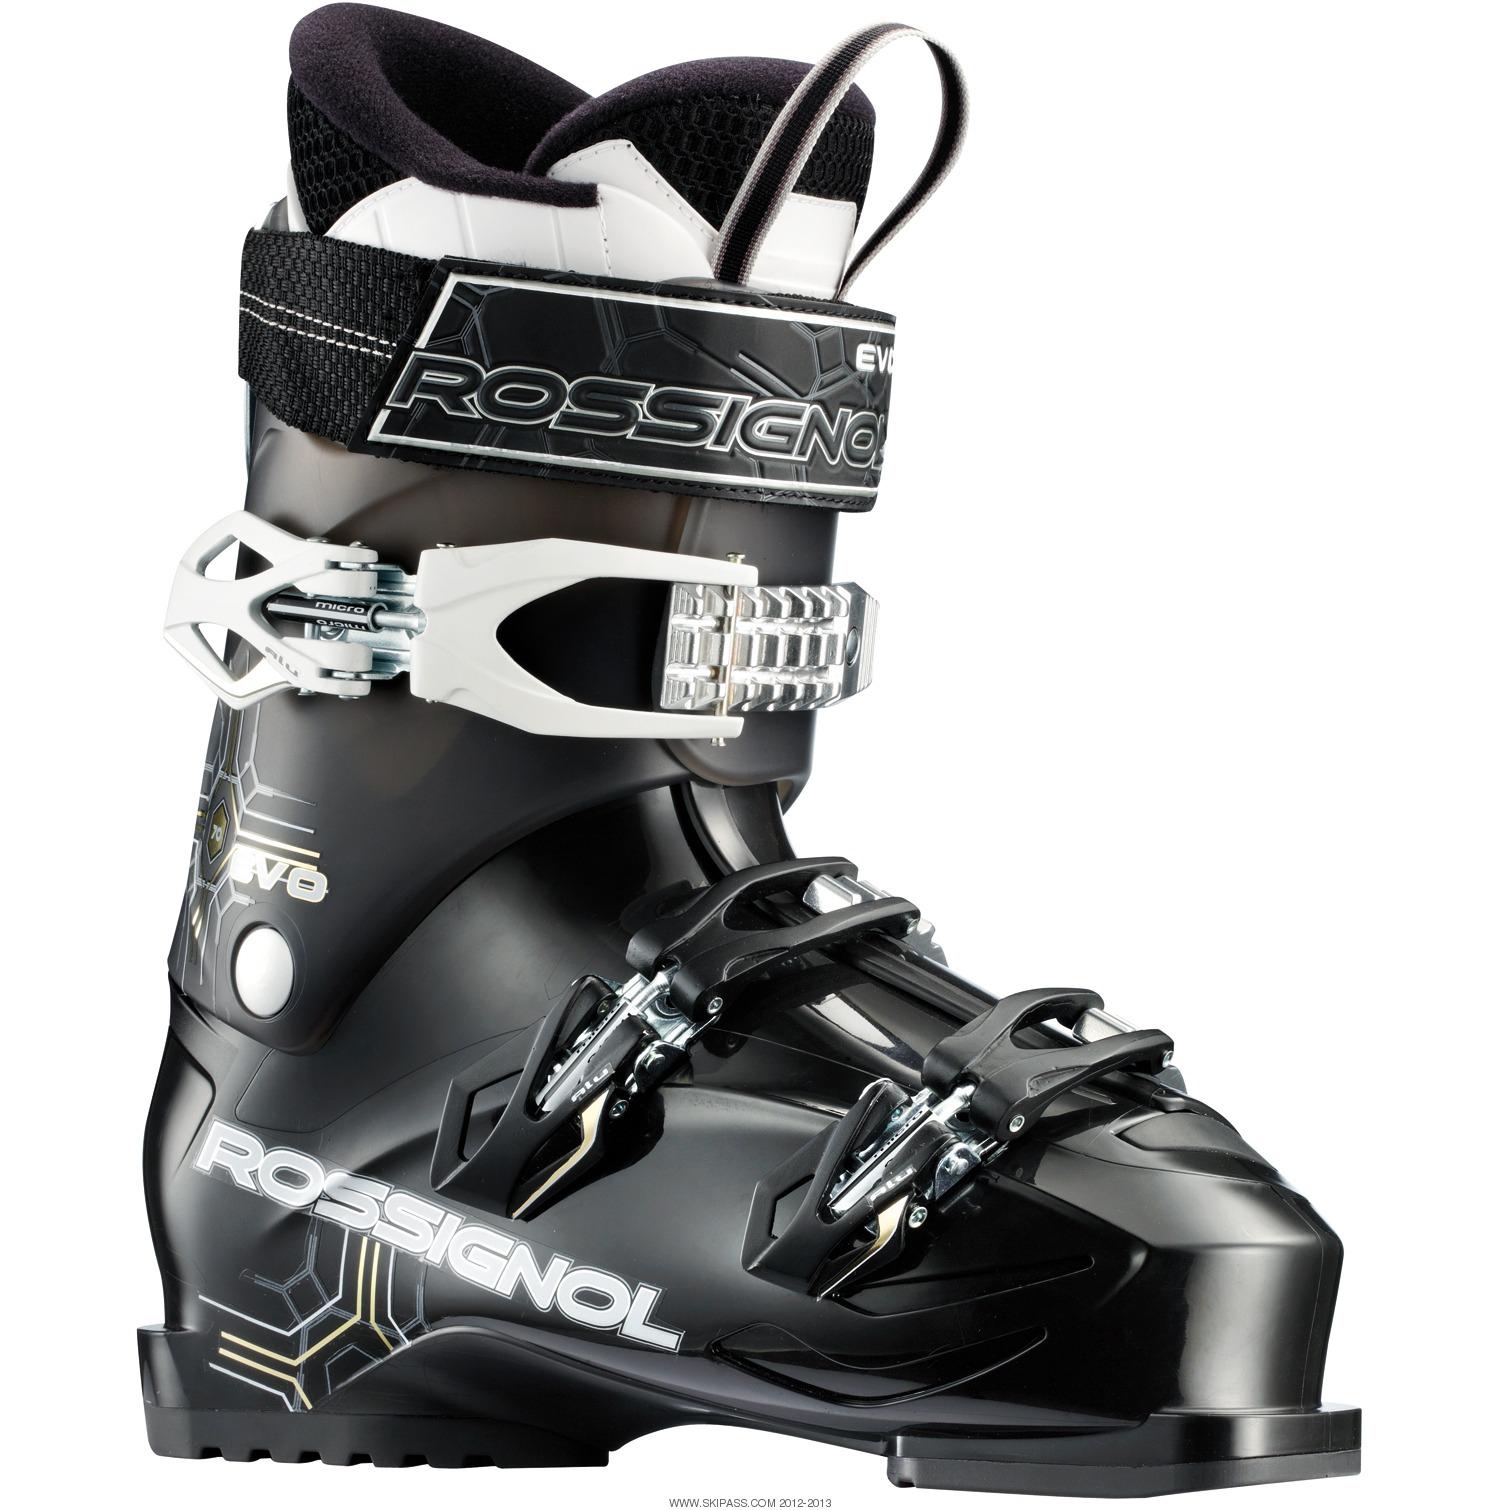 Chaussures de ski homme Rossignol Evo 70 - Plusieurs tailles dispo